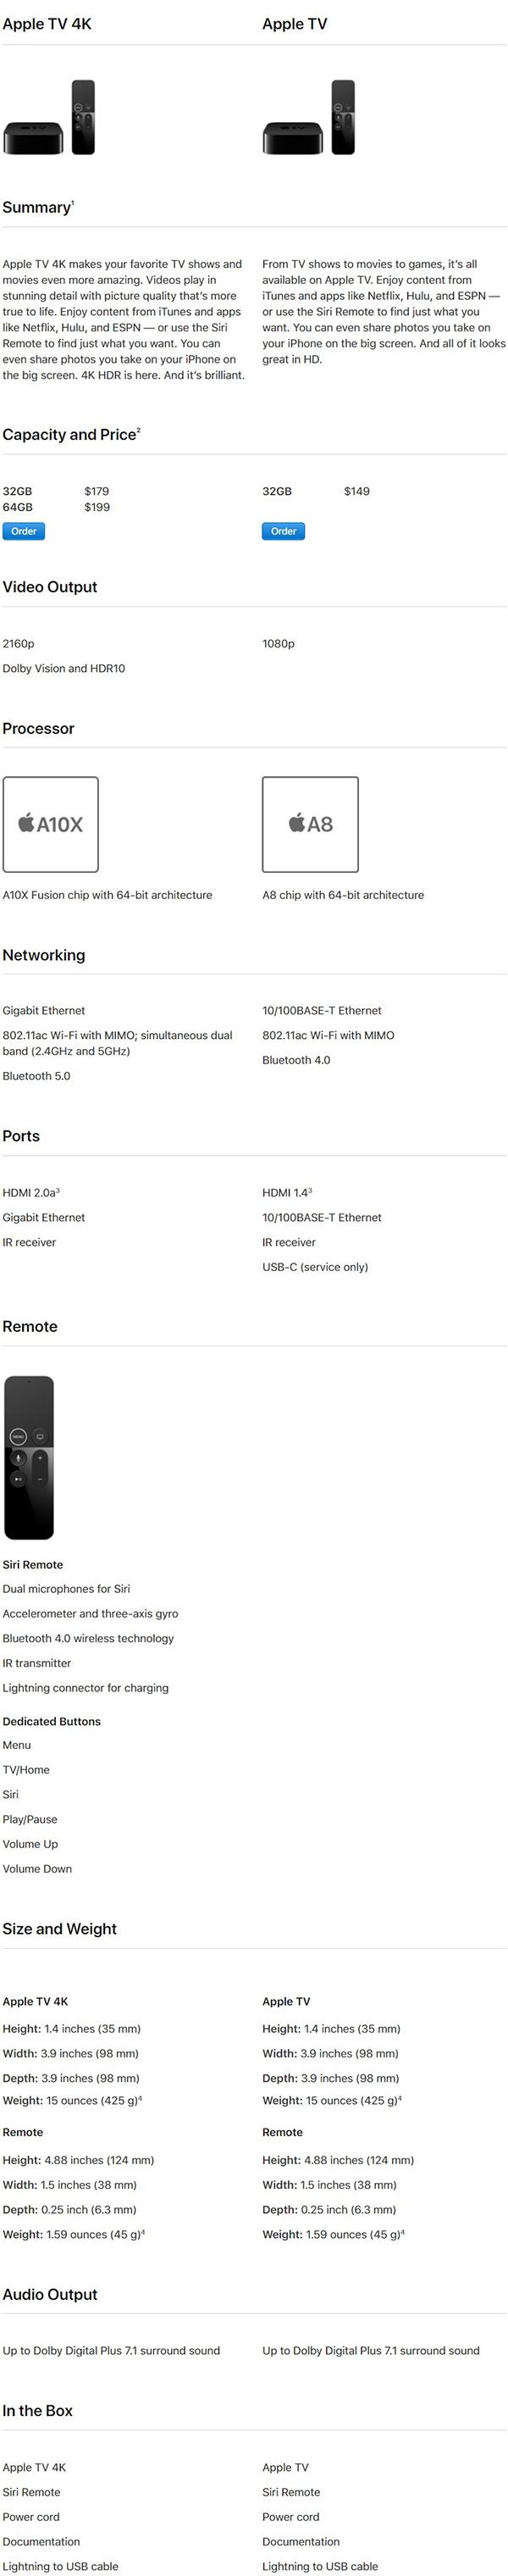 Apple TV 4K Vs Apple TV 4 Specs Comparison | Redmond Pie